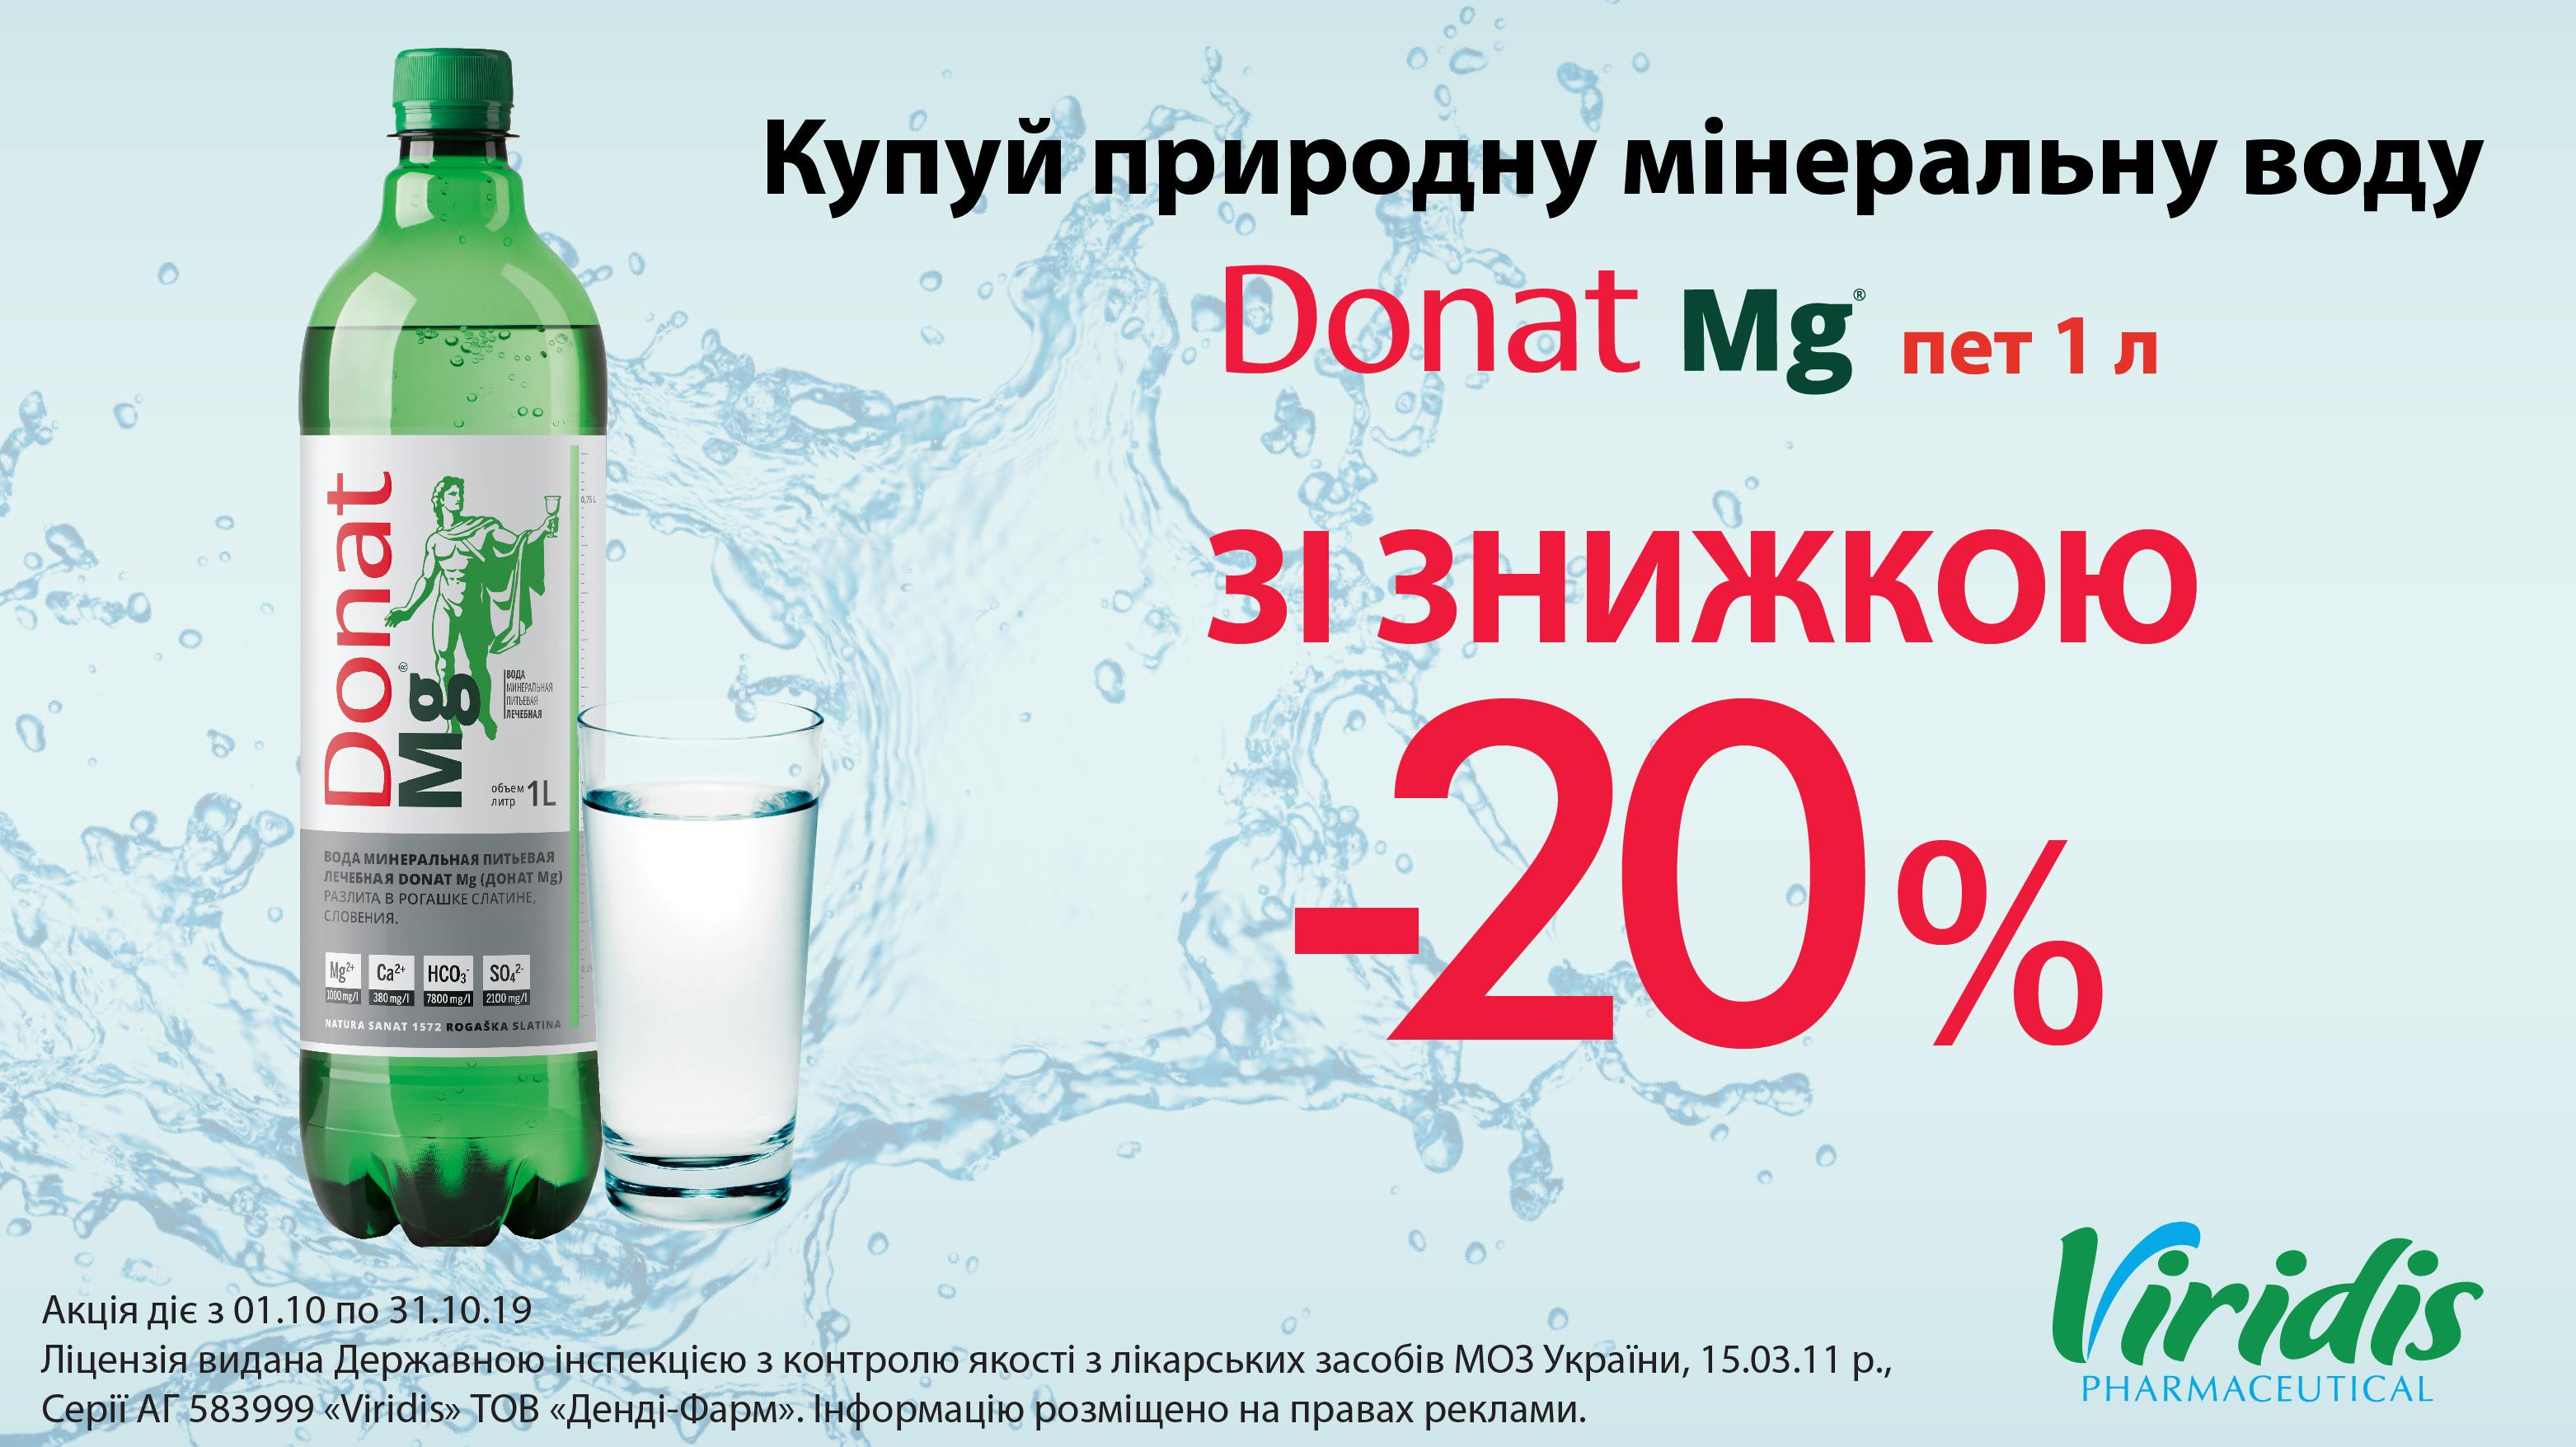 ЗНИЖКА -20% НА МІНЕРАЛЬНУ ВОДУ DONAT MG.   #1